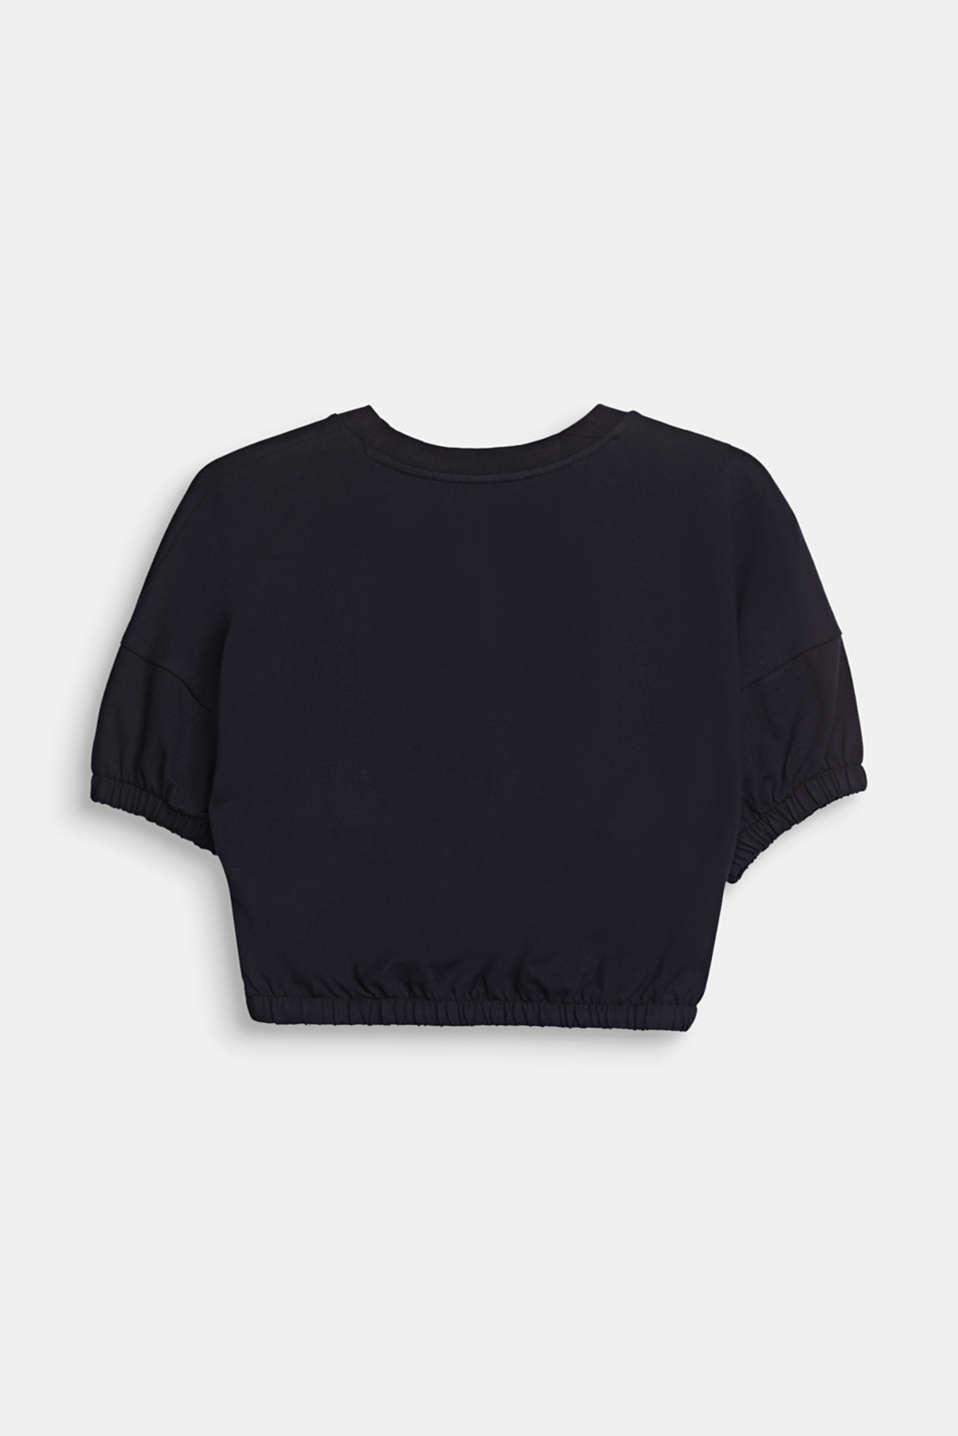 Cropped, printed T-shirt in piqué, 100% cotton, LCBLACK, detail image number 1